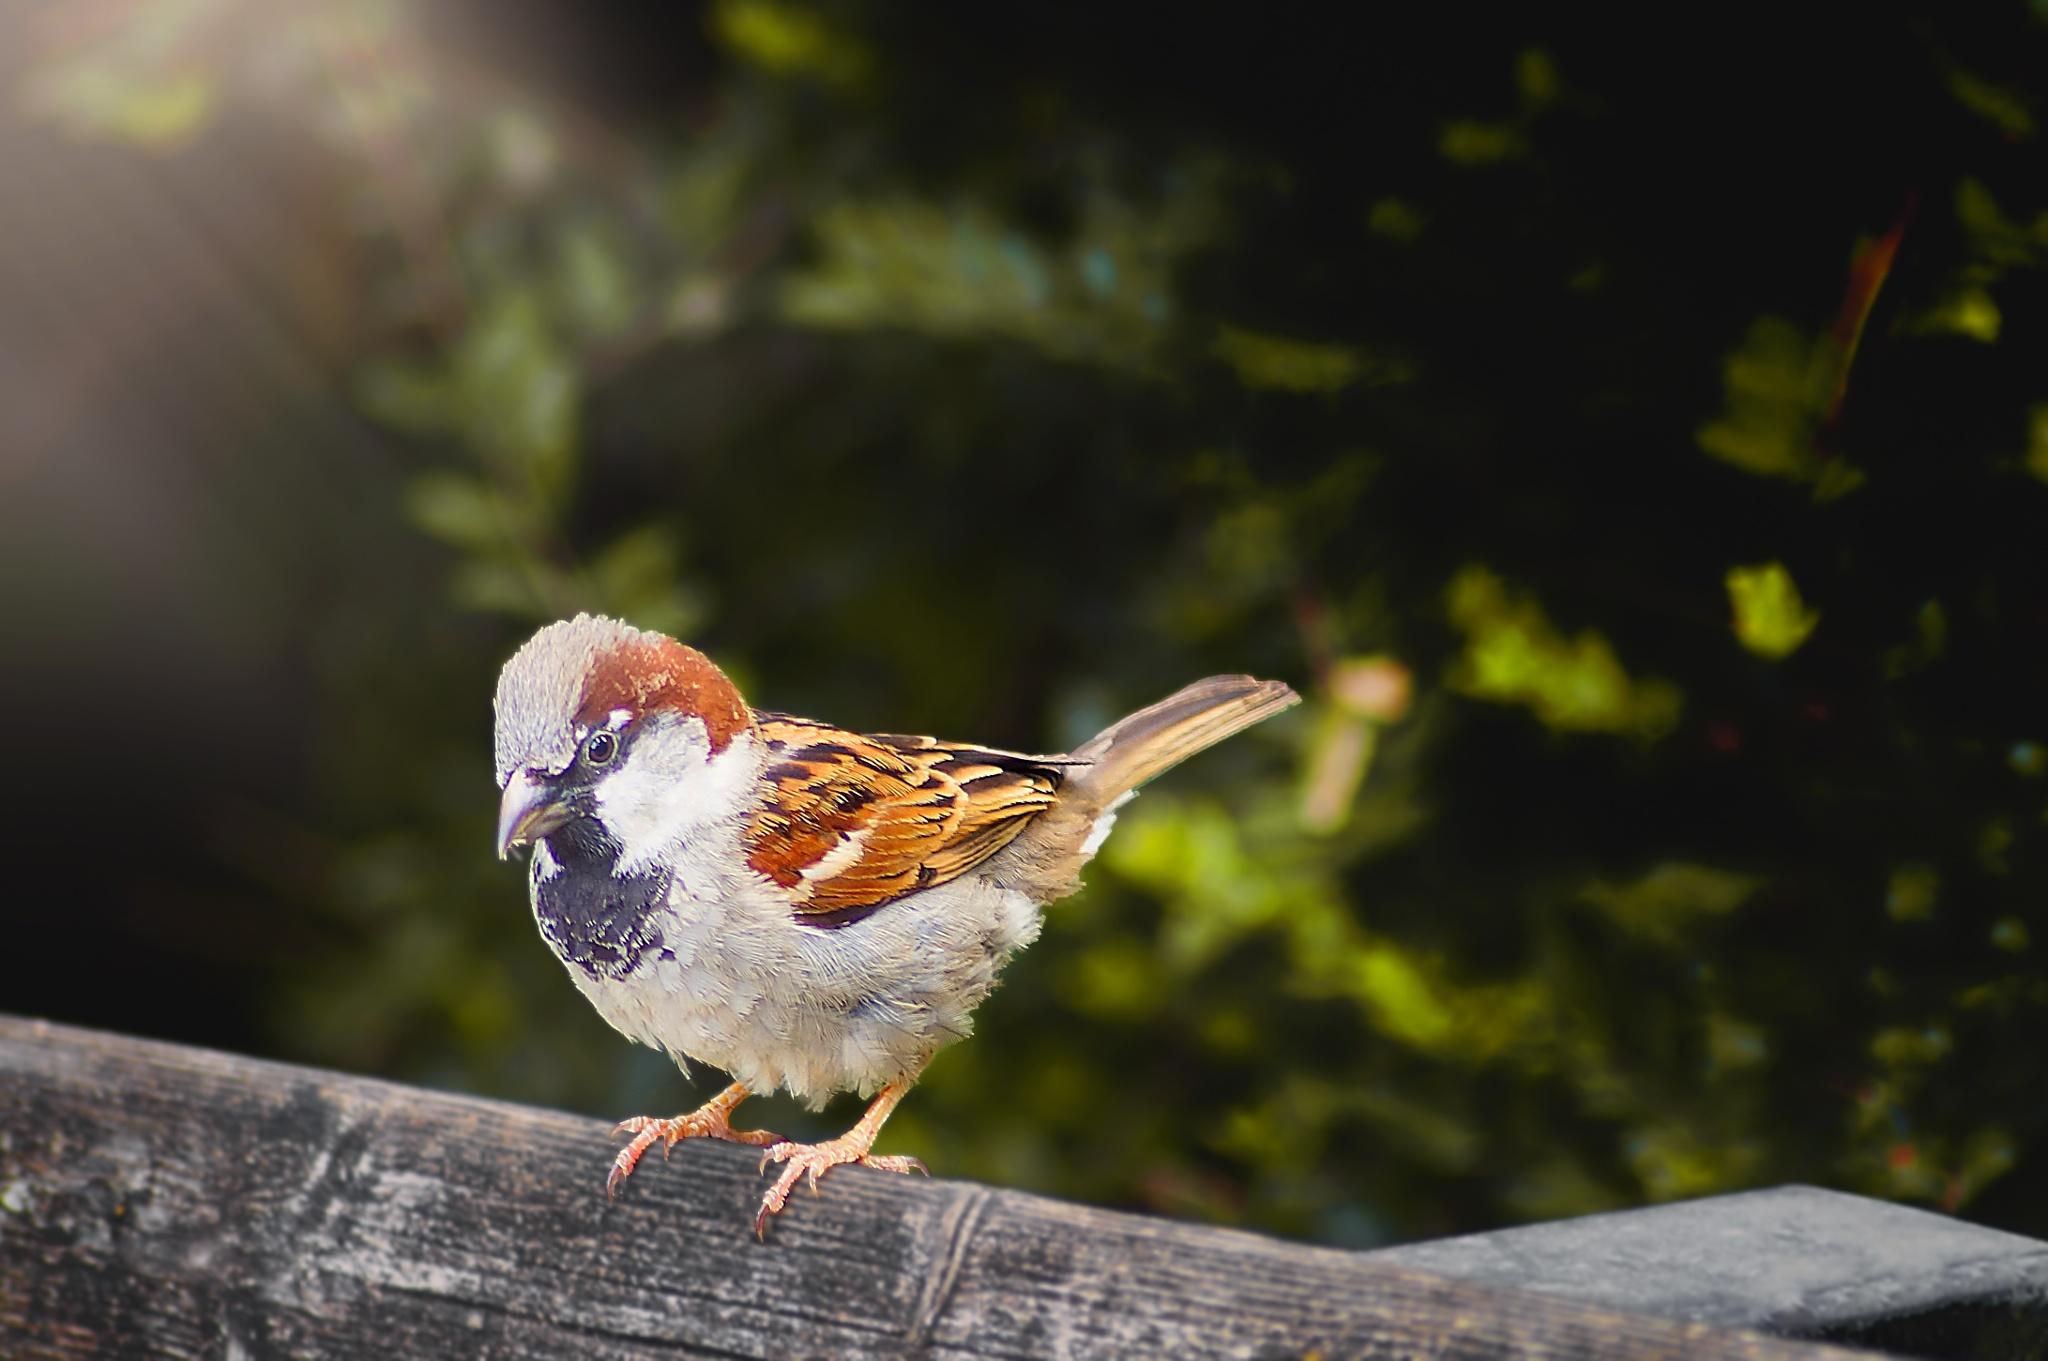 Sparrow by Mustafa Celebi